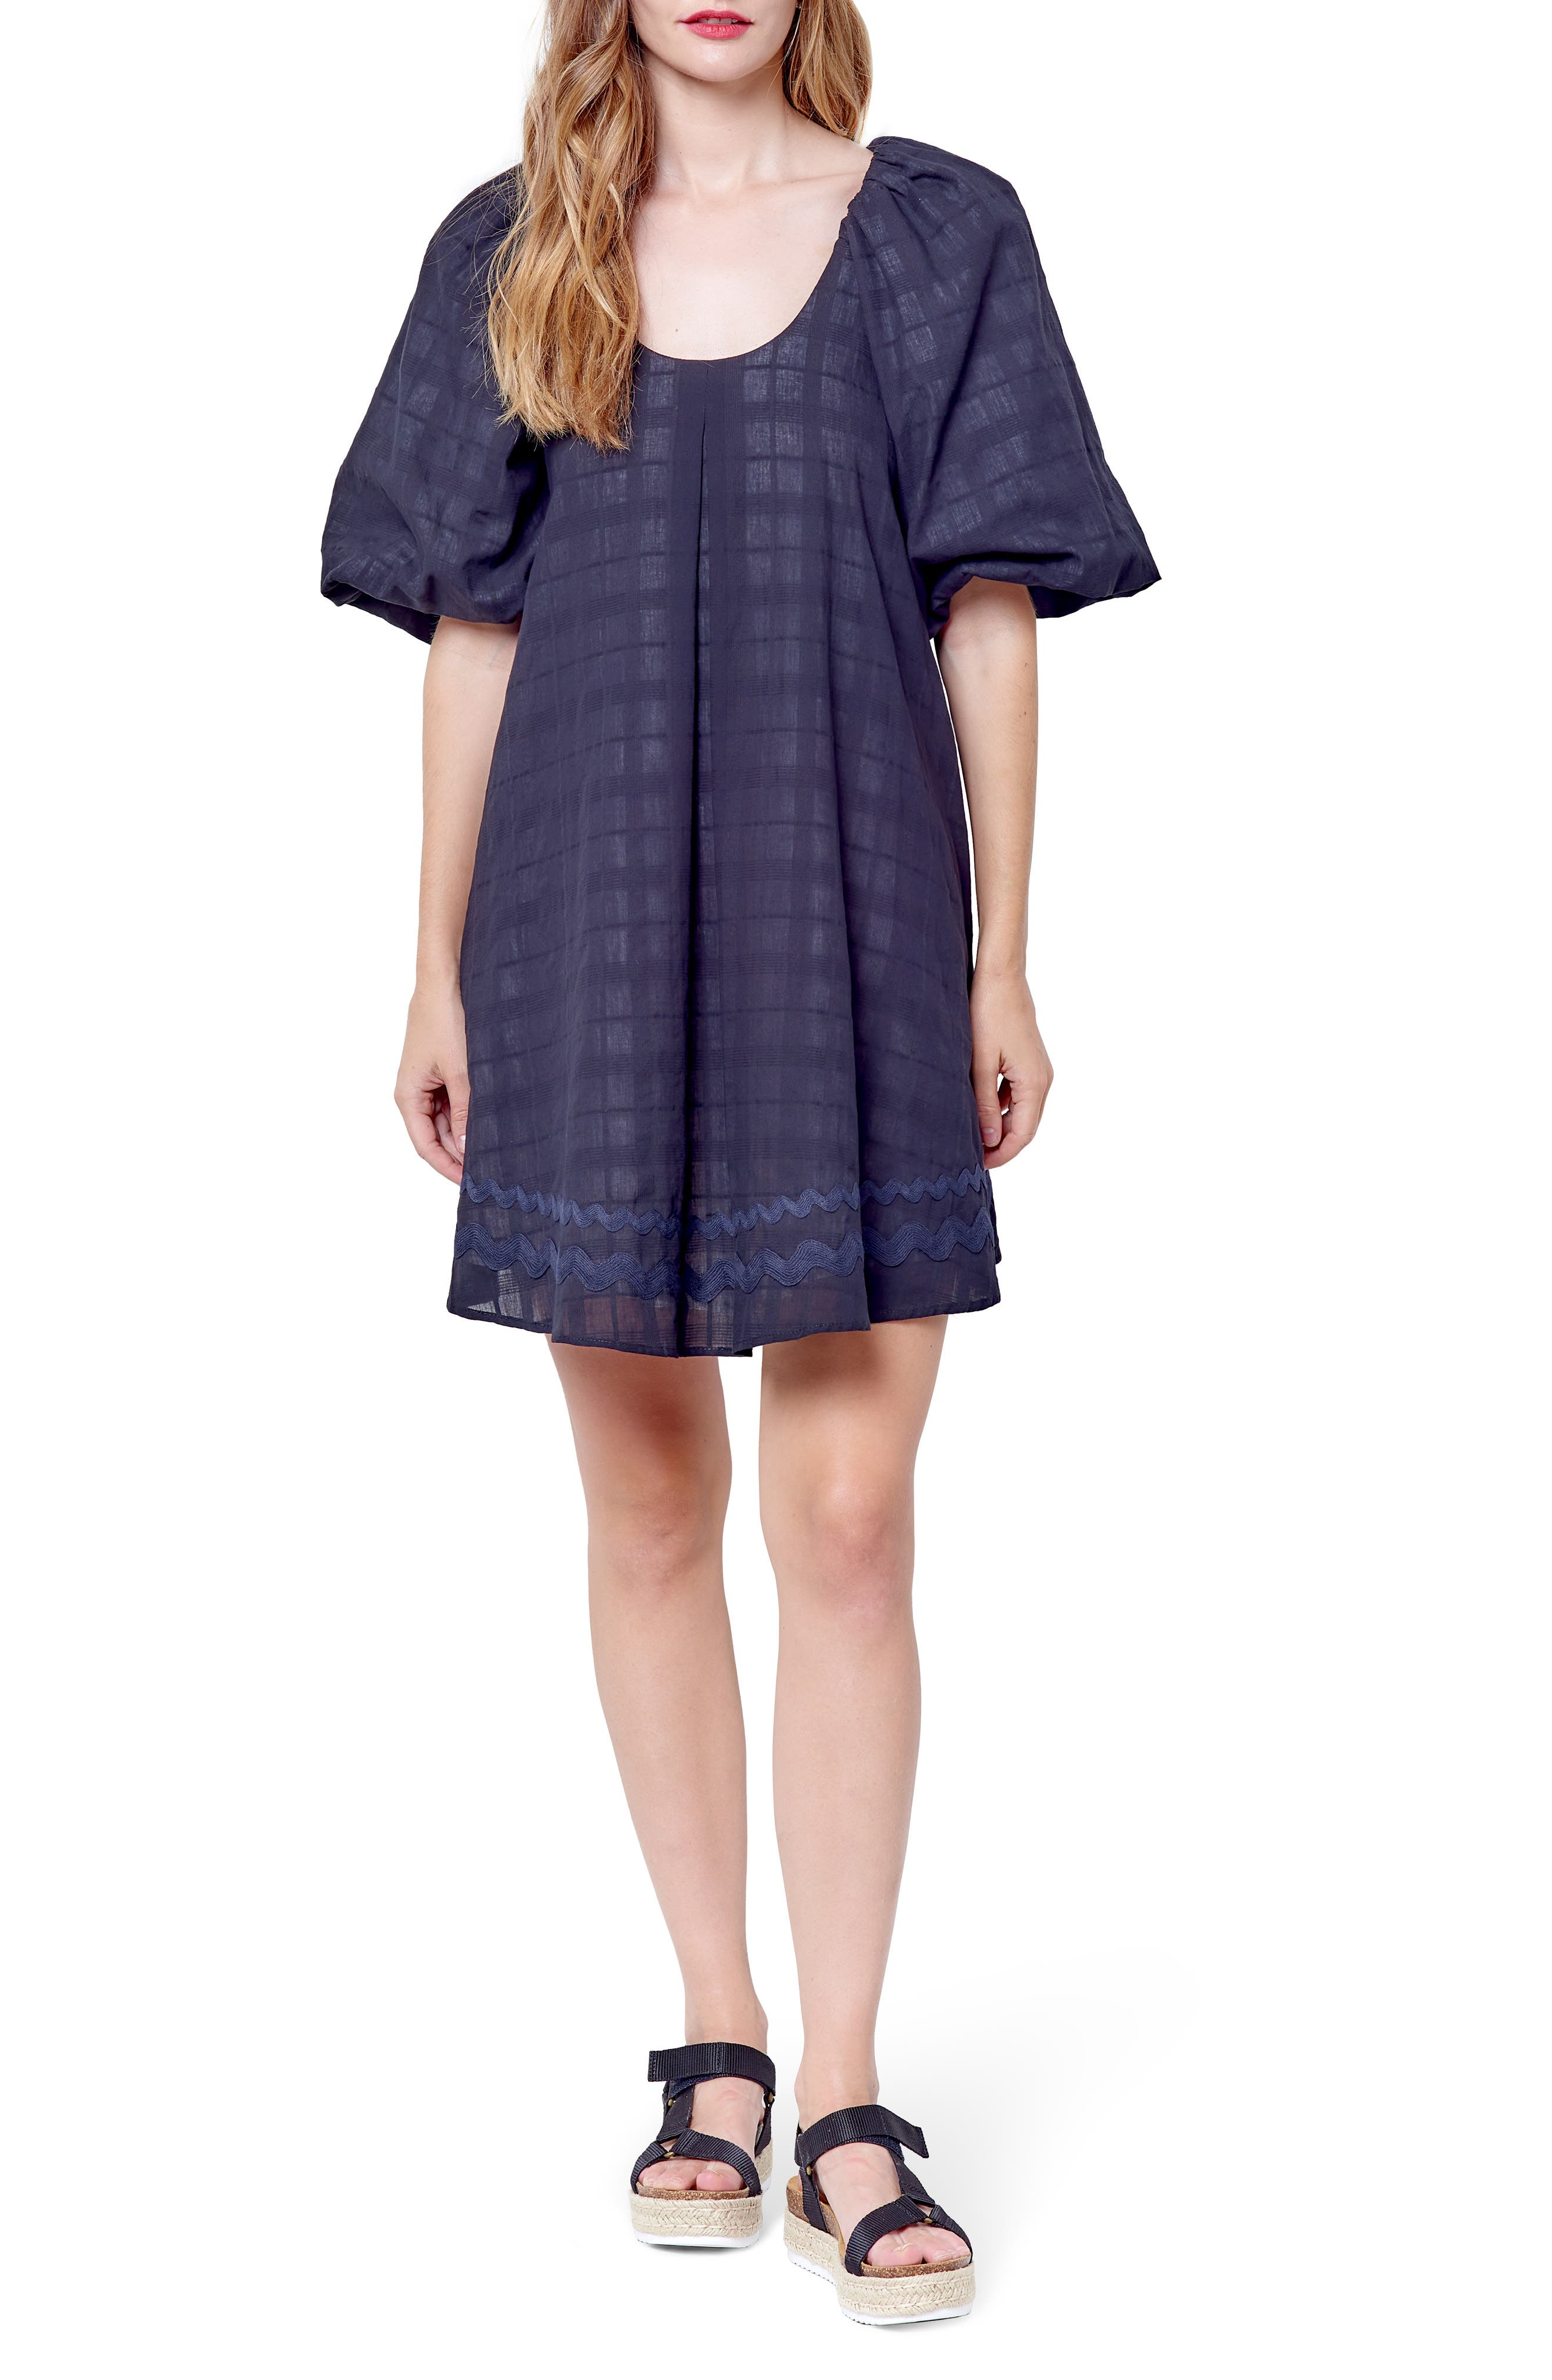 Hariette Puff Sleeve Minidress